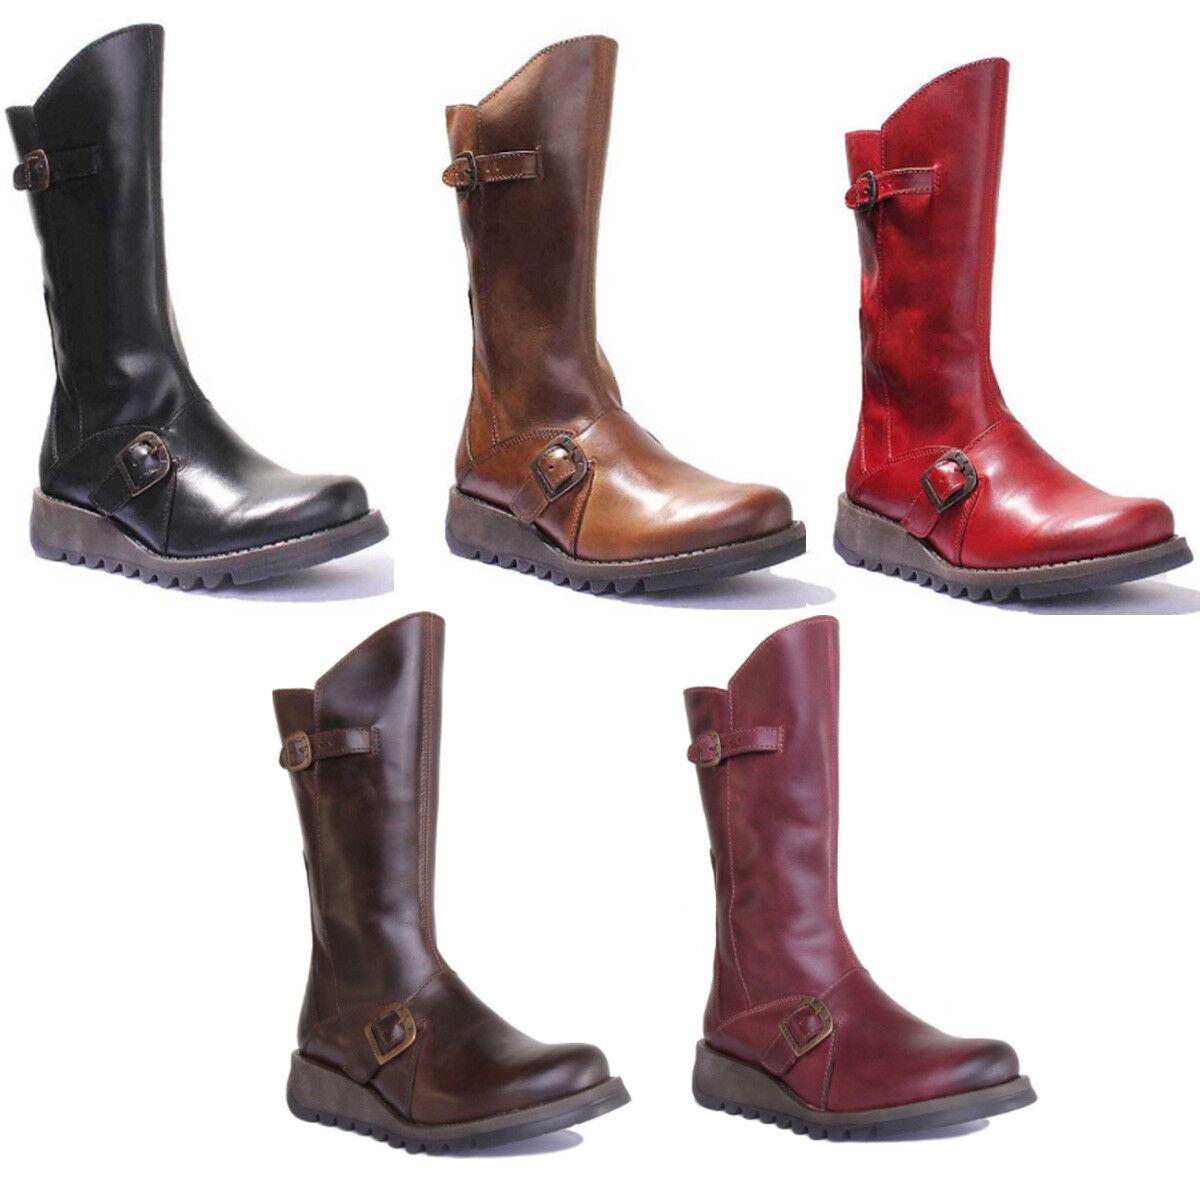 Fly London Mes 2 Women Brown Leather Matt Long Boots UK Size 3 - 8